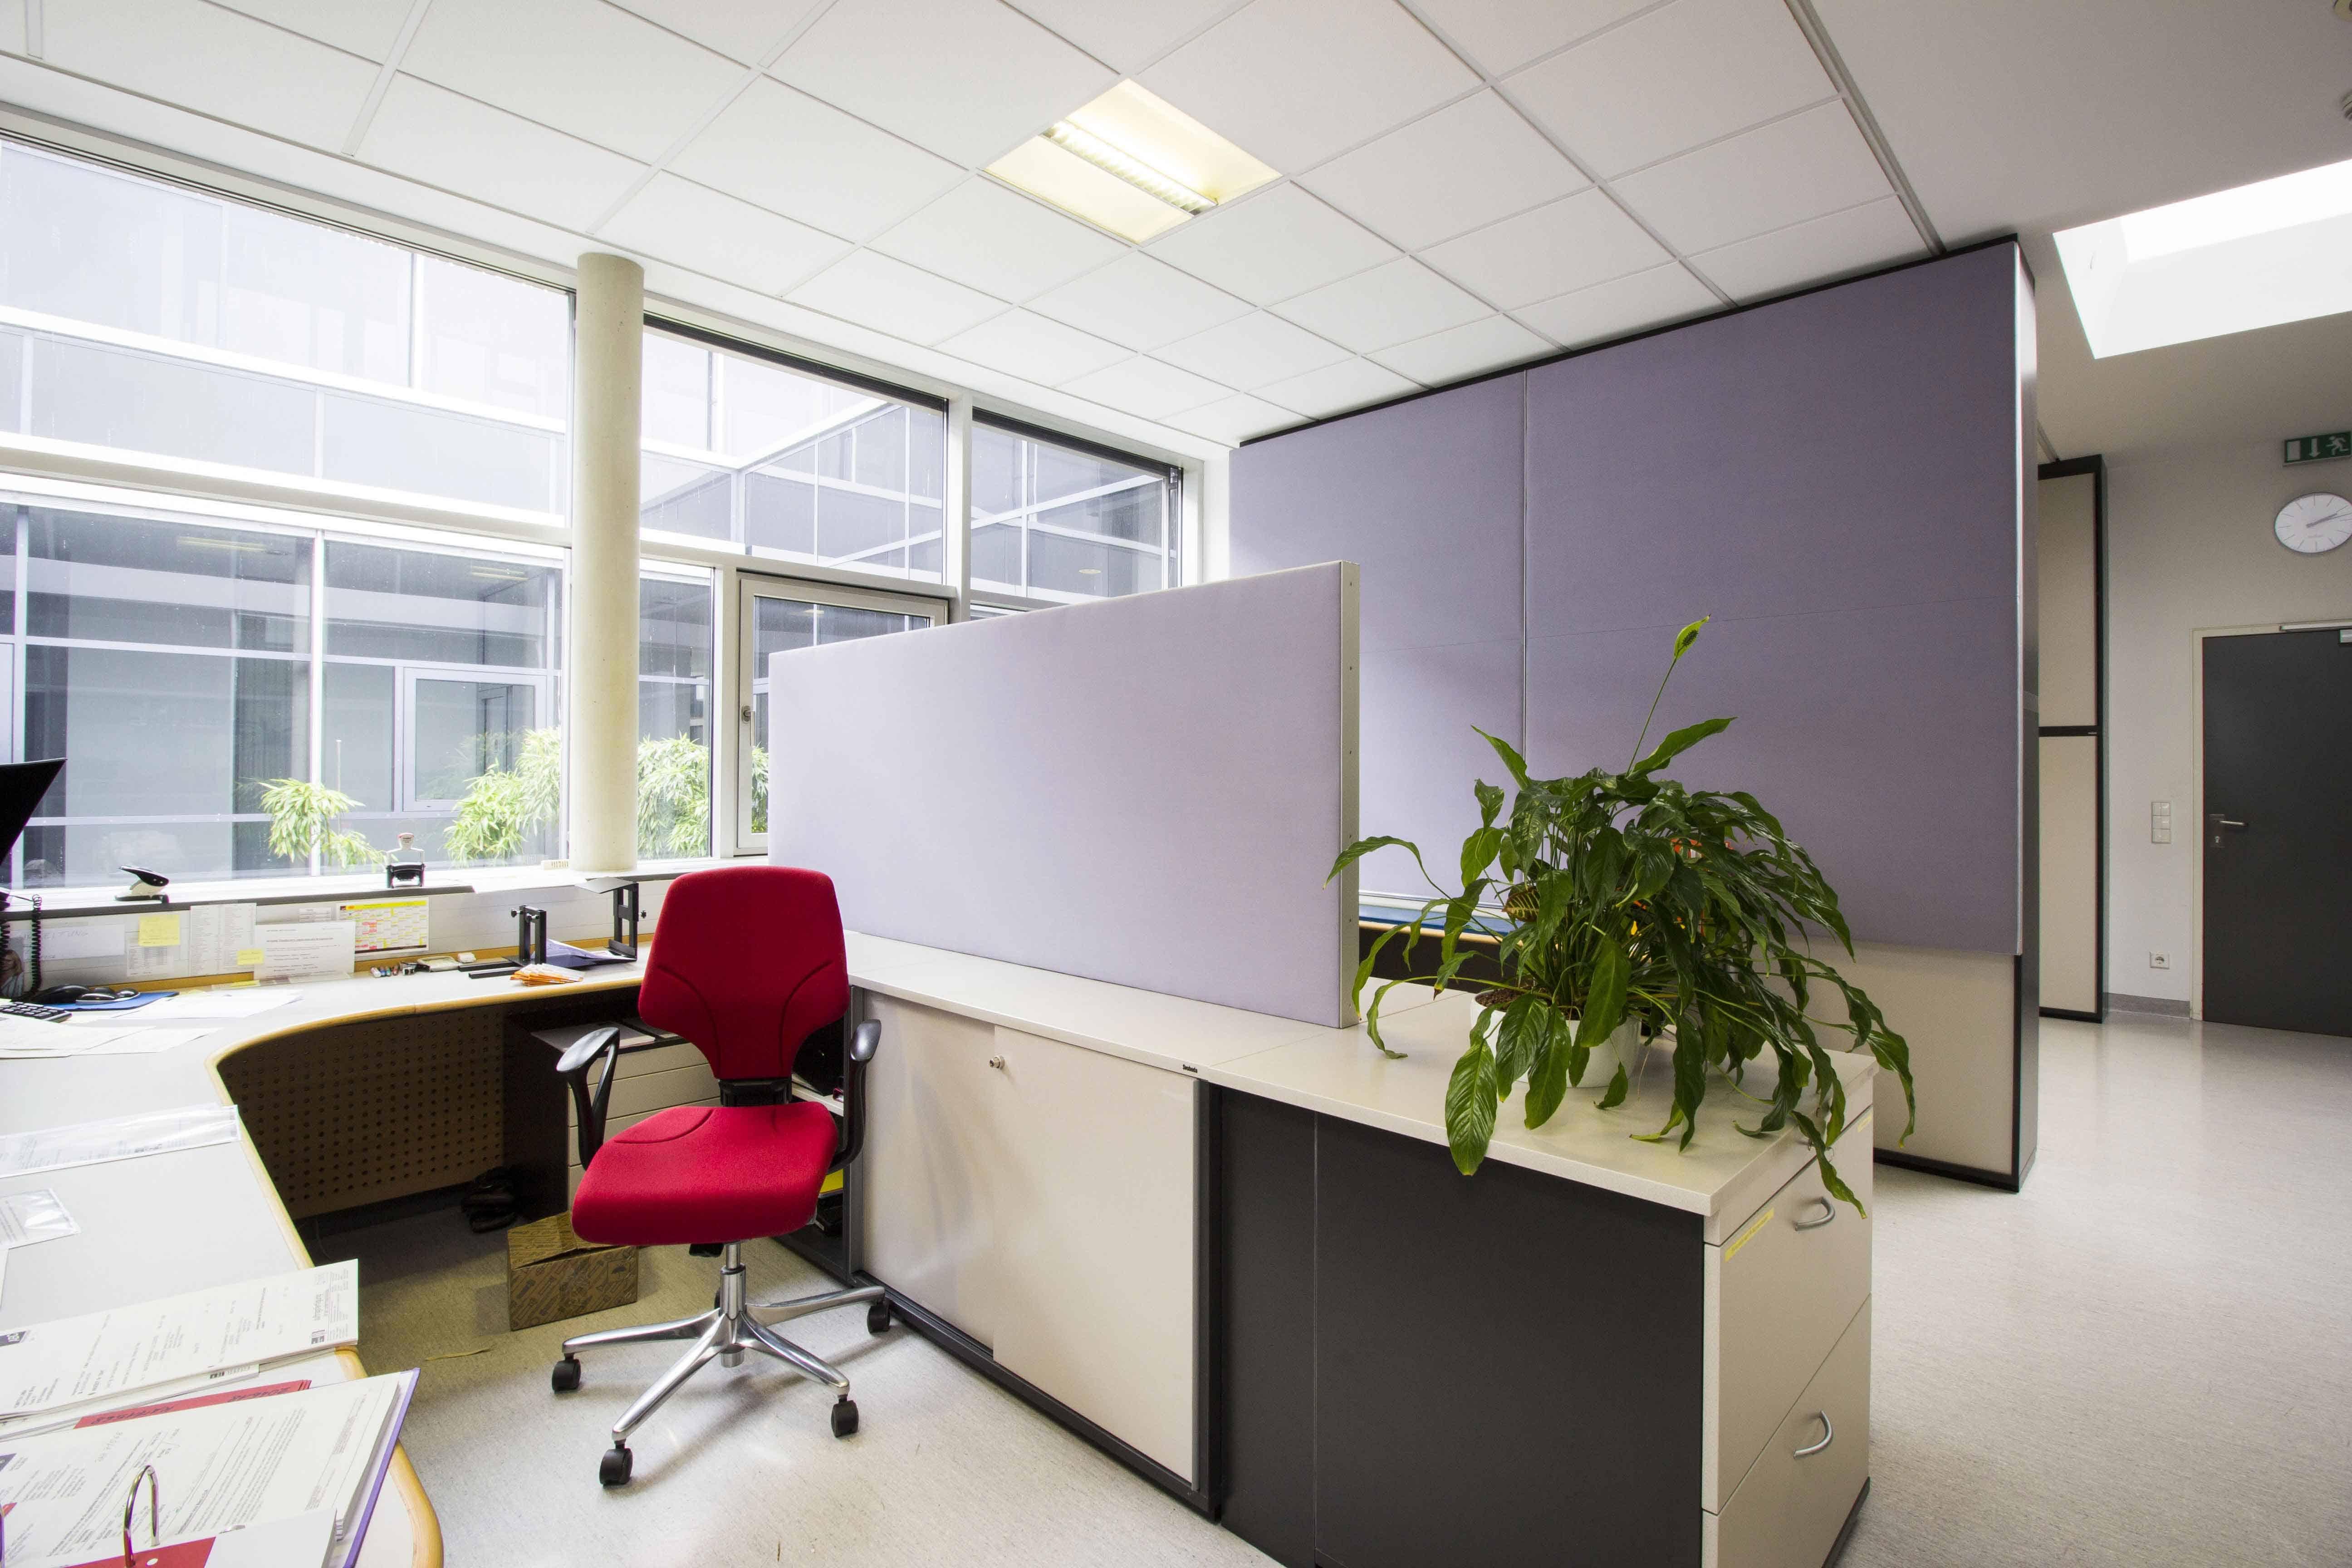 Verbesserung der Raumakustik im Großraumbüro durch verschiedene Absorber